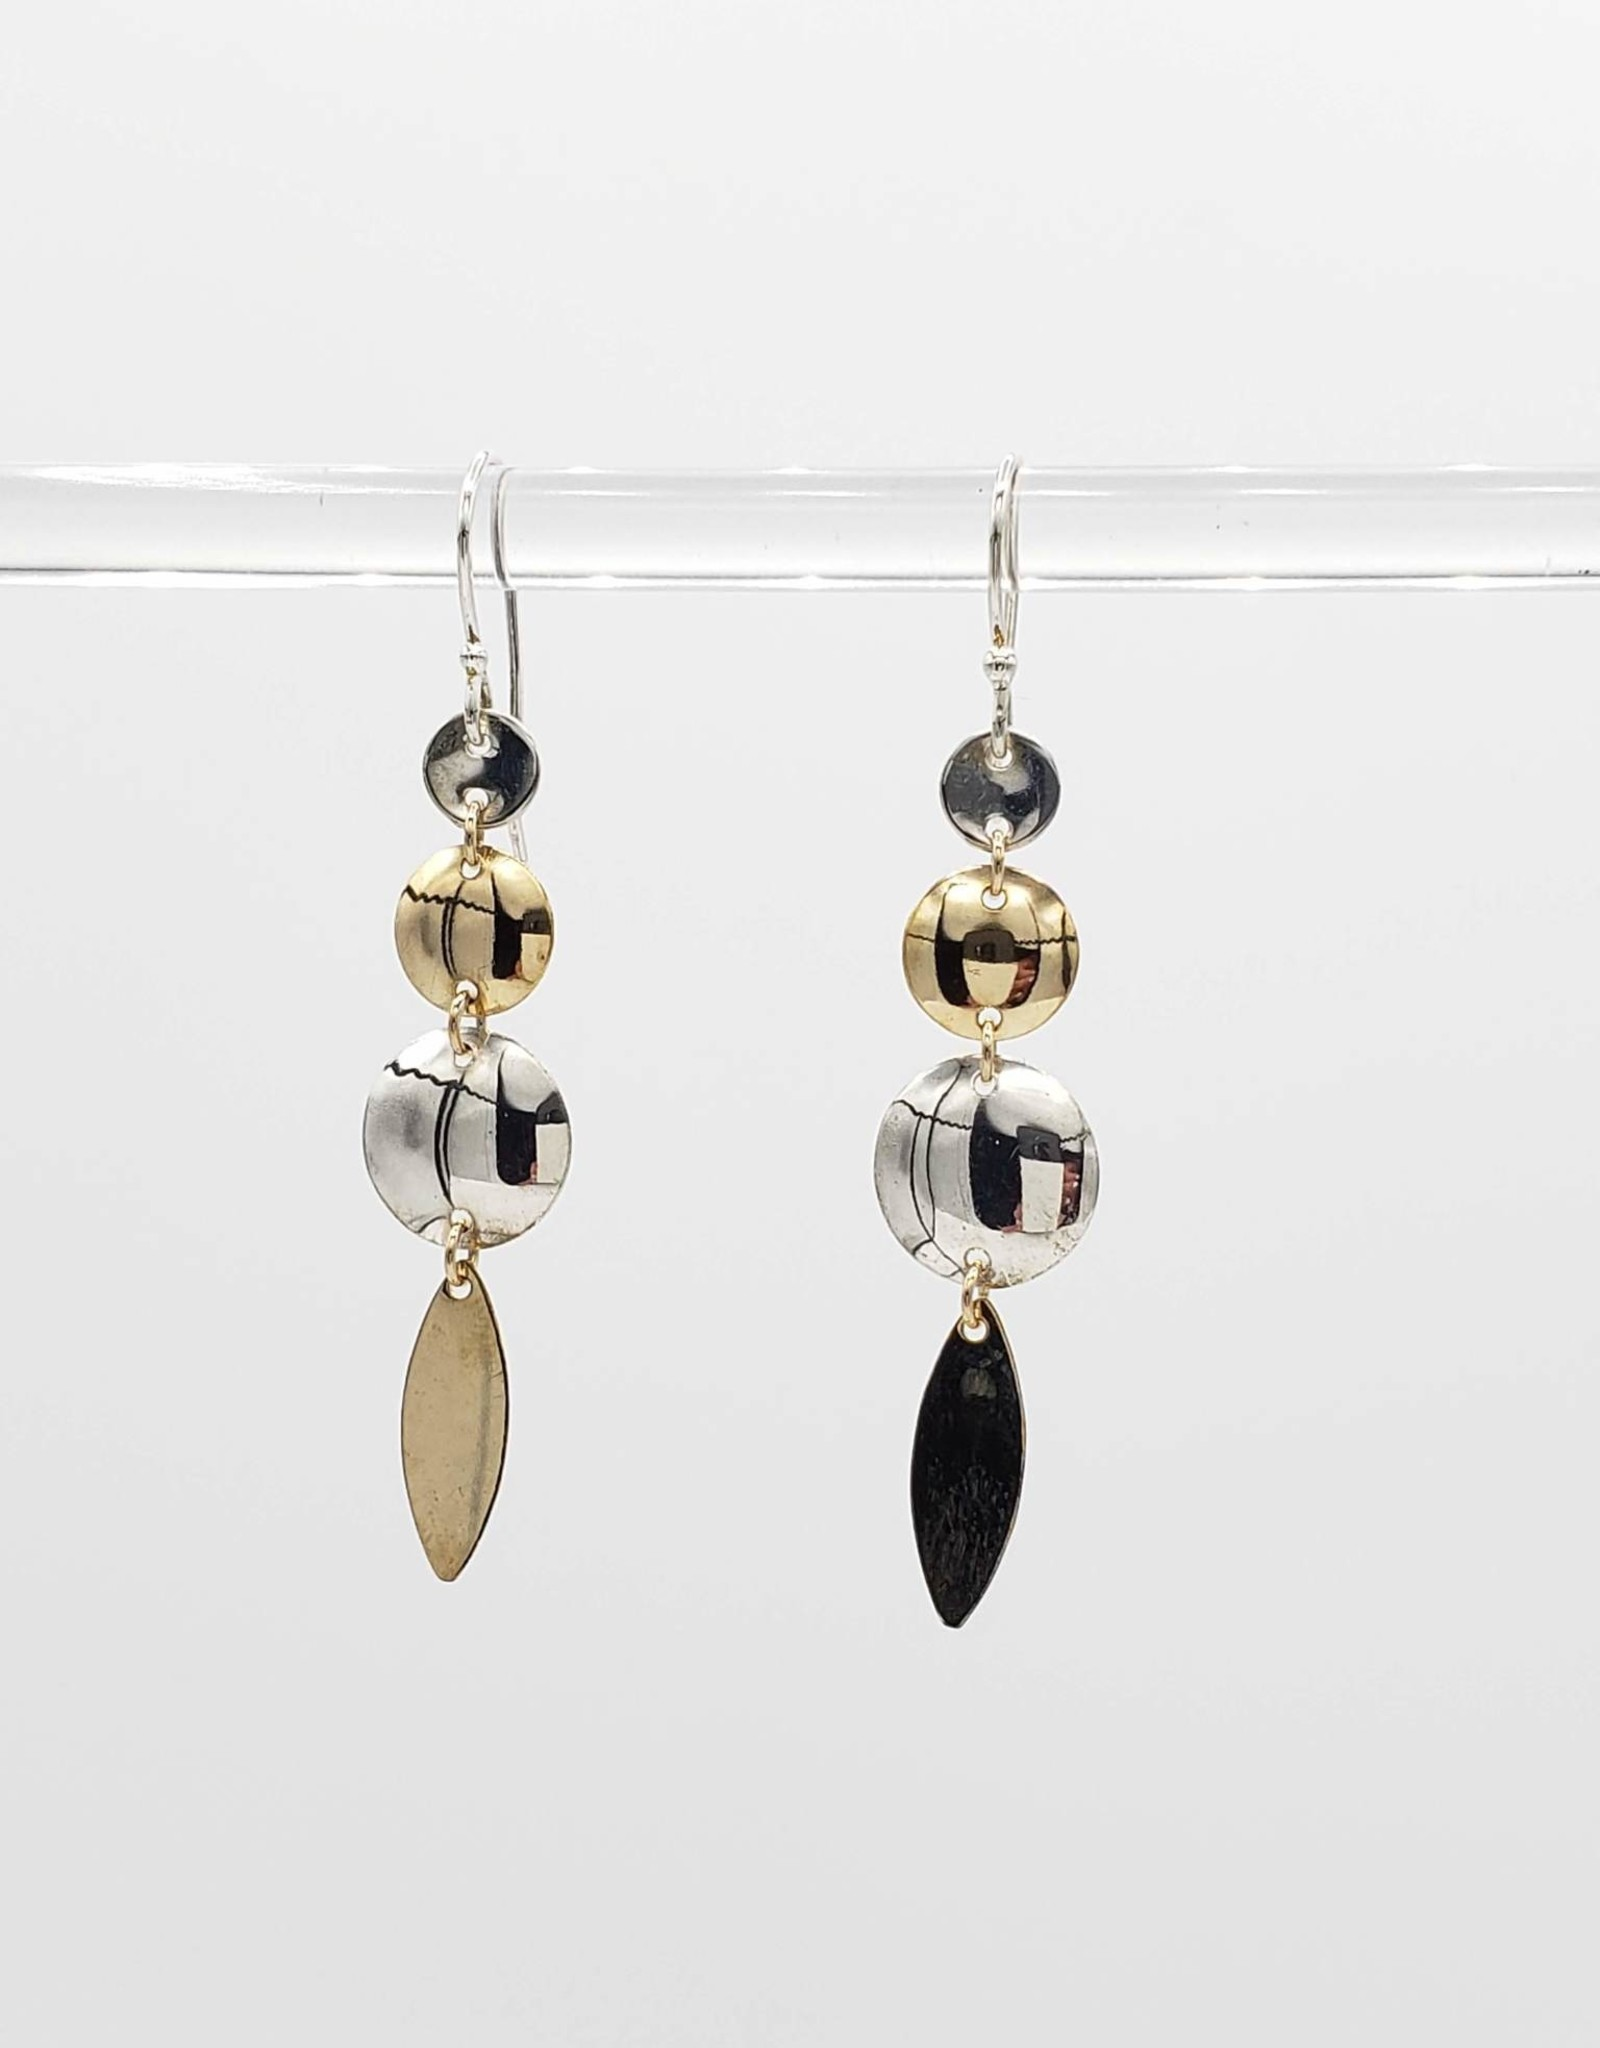 Peter James Jewelry Dangling Crockett Mixed Metal Earrings, Sterling + Gold Fill - Peter James Jewelry